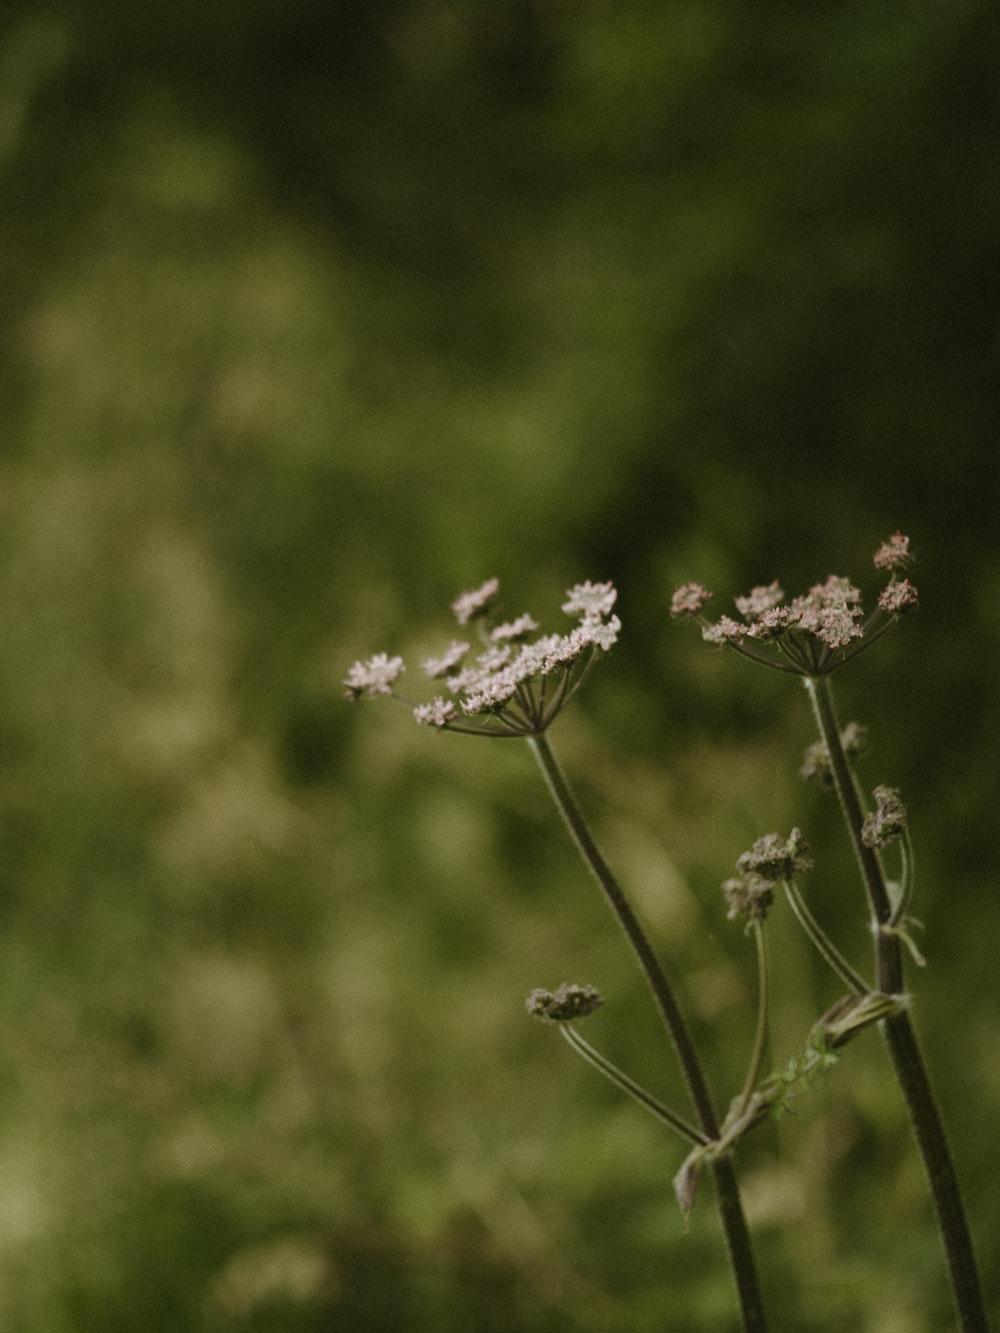 white wild flowers blooming